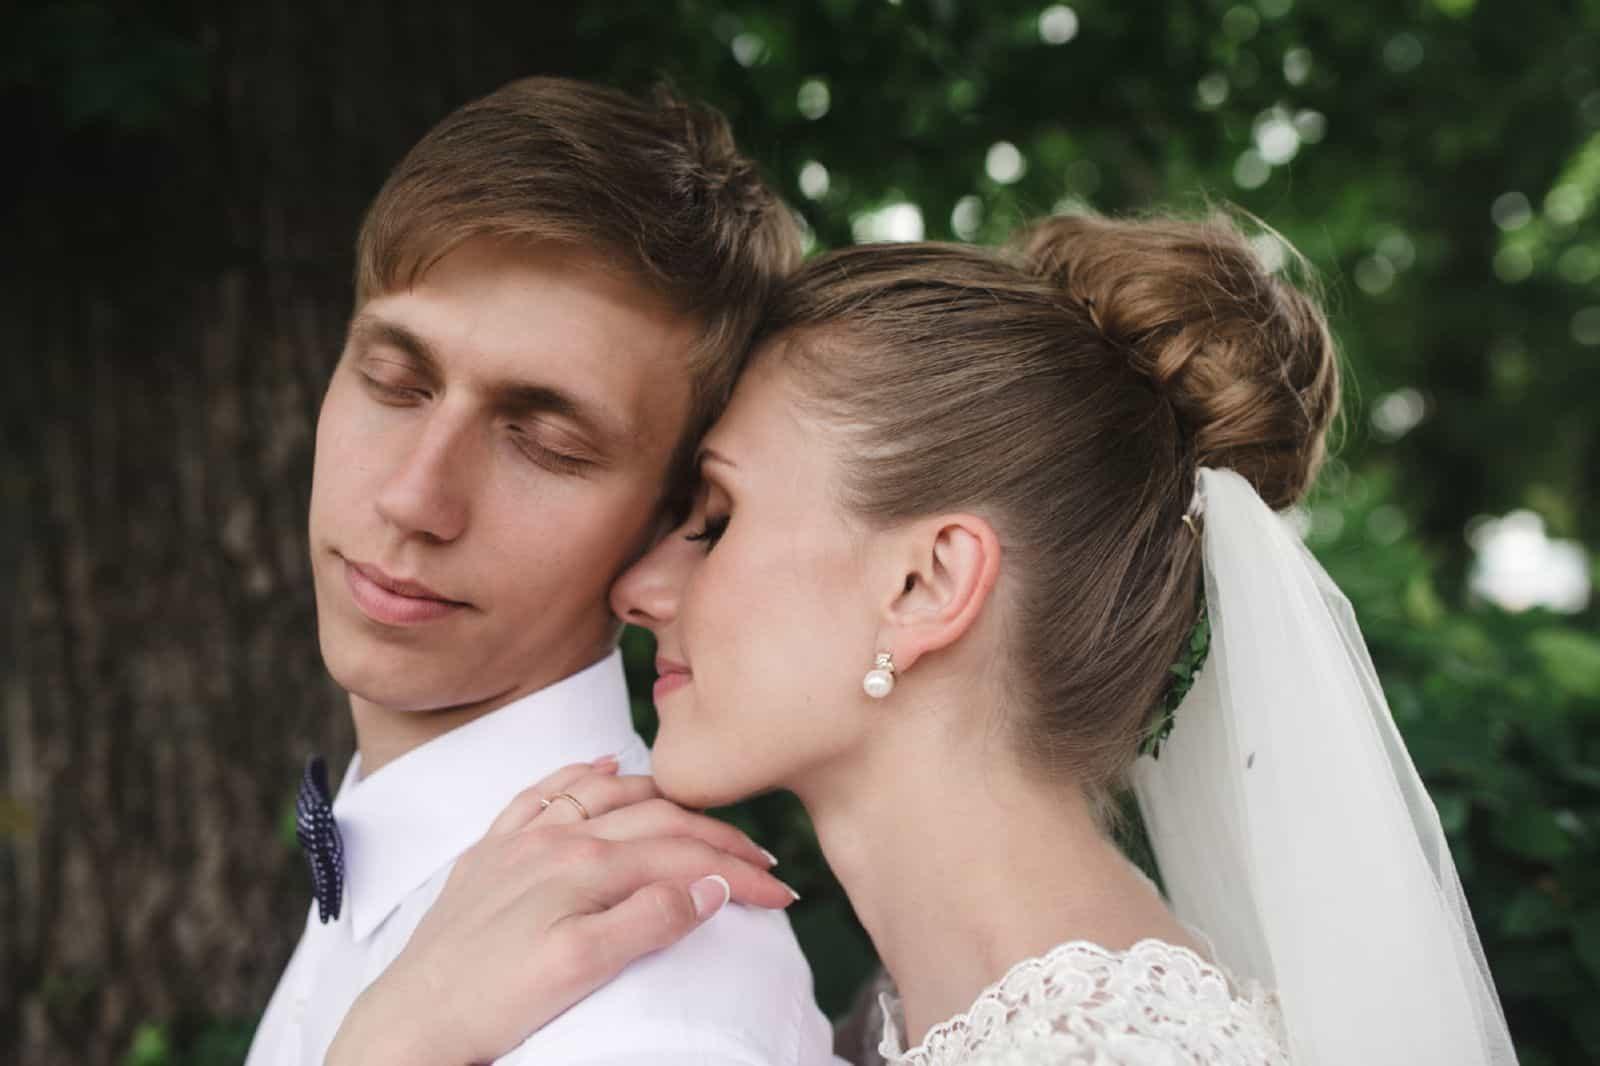 Регистрация брака при беременности сроки